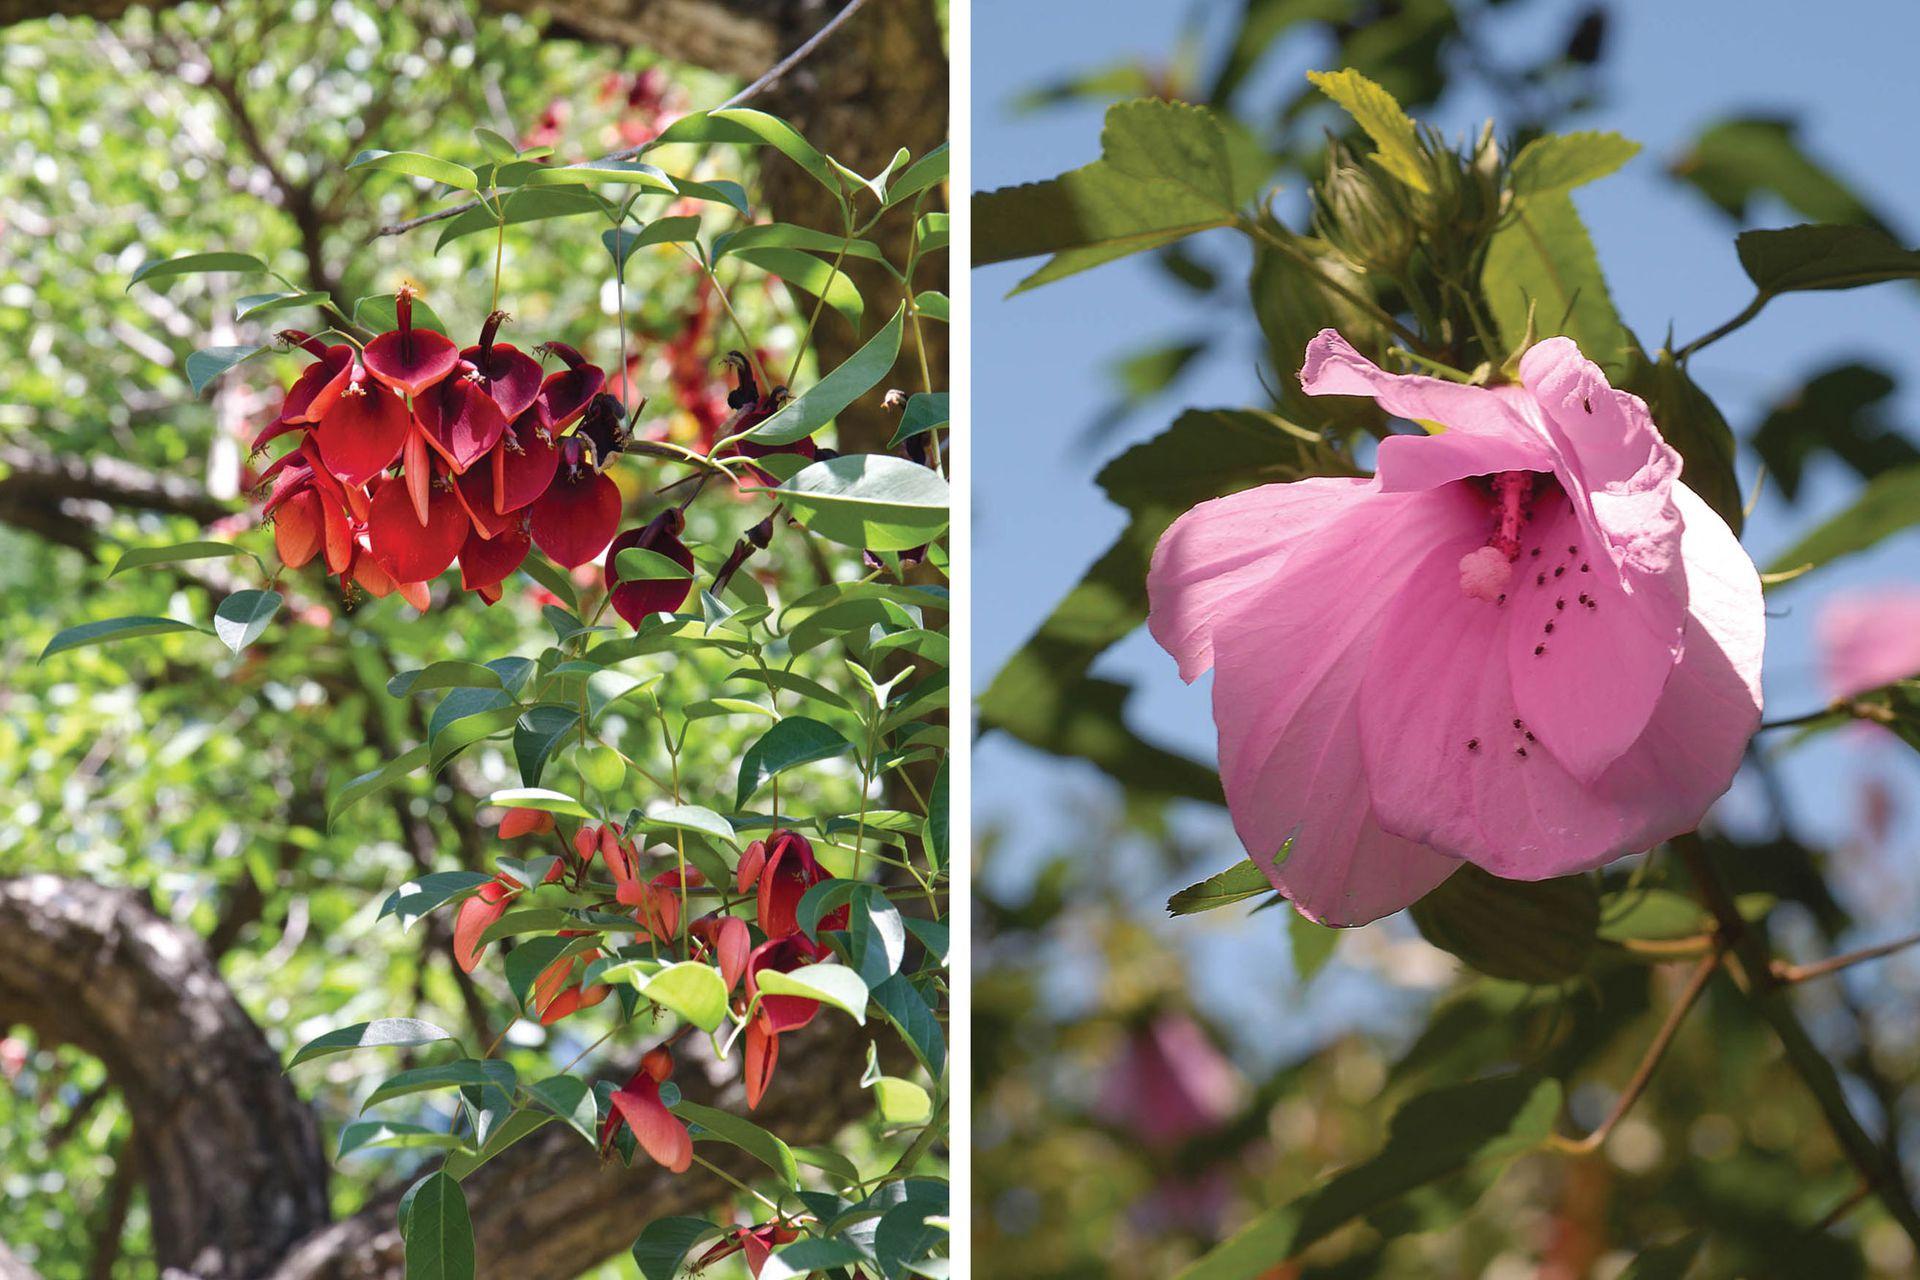 Izquierda: Erythrina crista-galli, popularmente conocido como ceibo, seibo o suinandí. Derecha: Hibiscus striatus, llamada rosa del río, rosa del bañado o flor bonita.